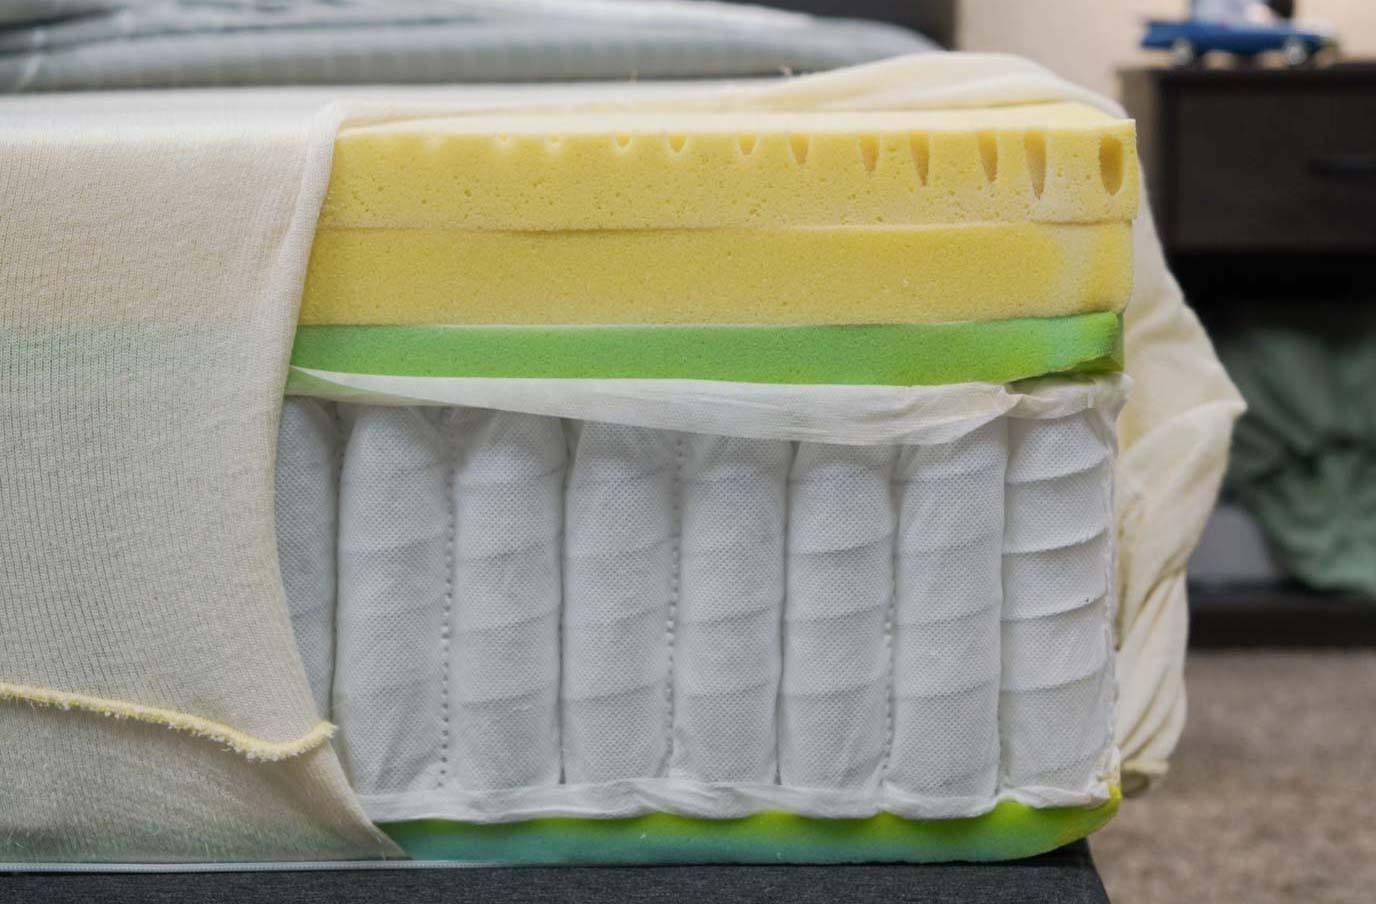 spring hybrid coil mattress reviews